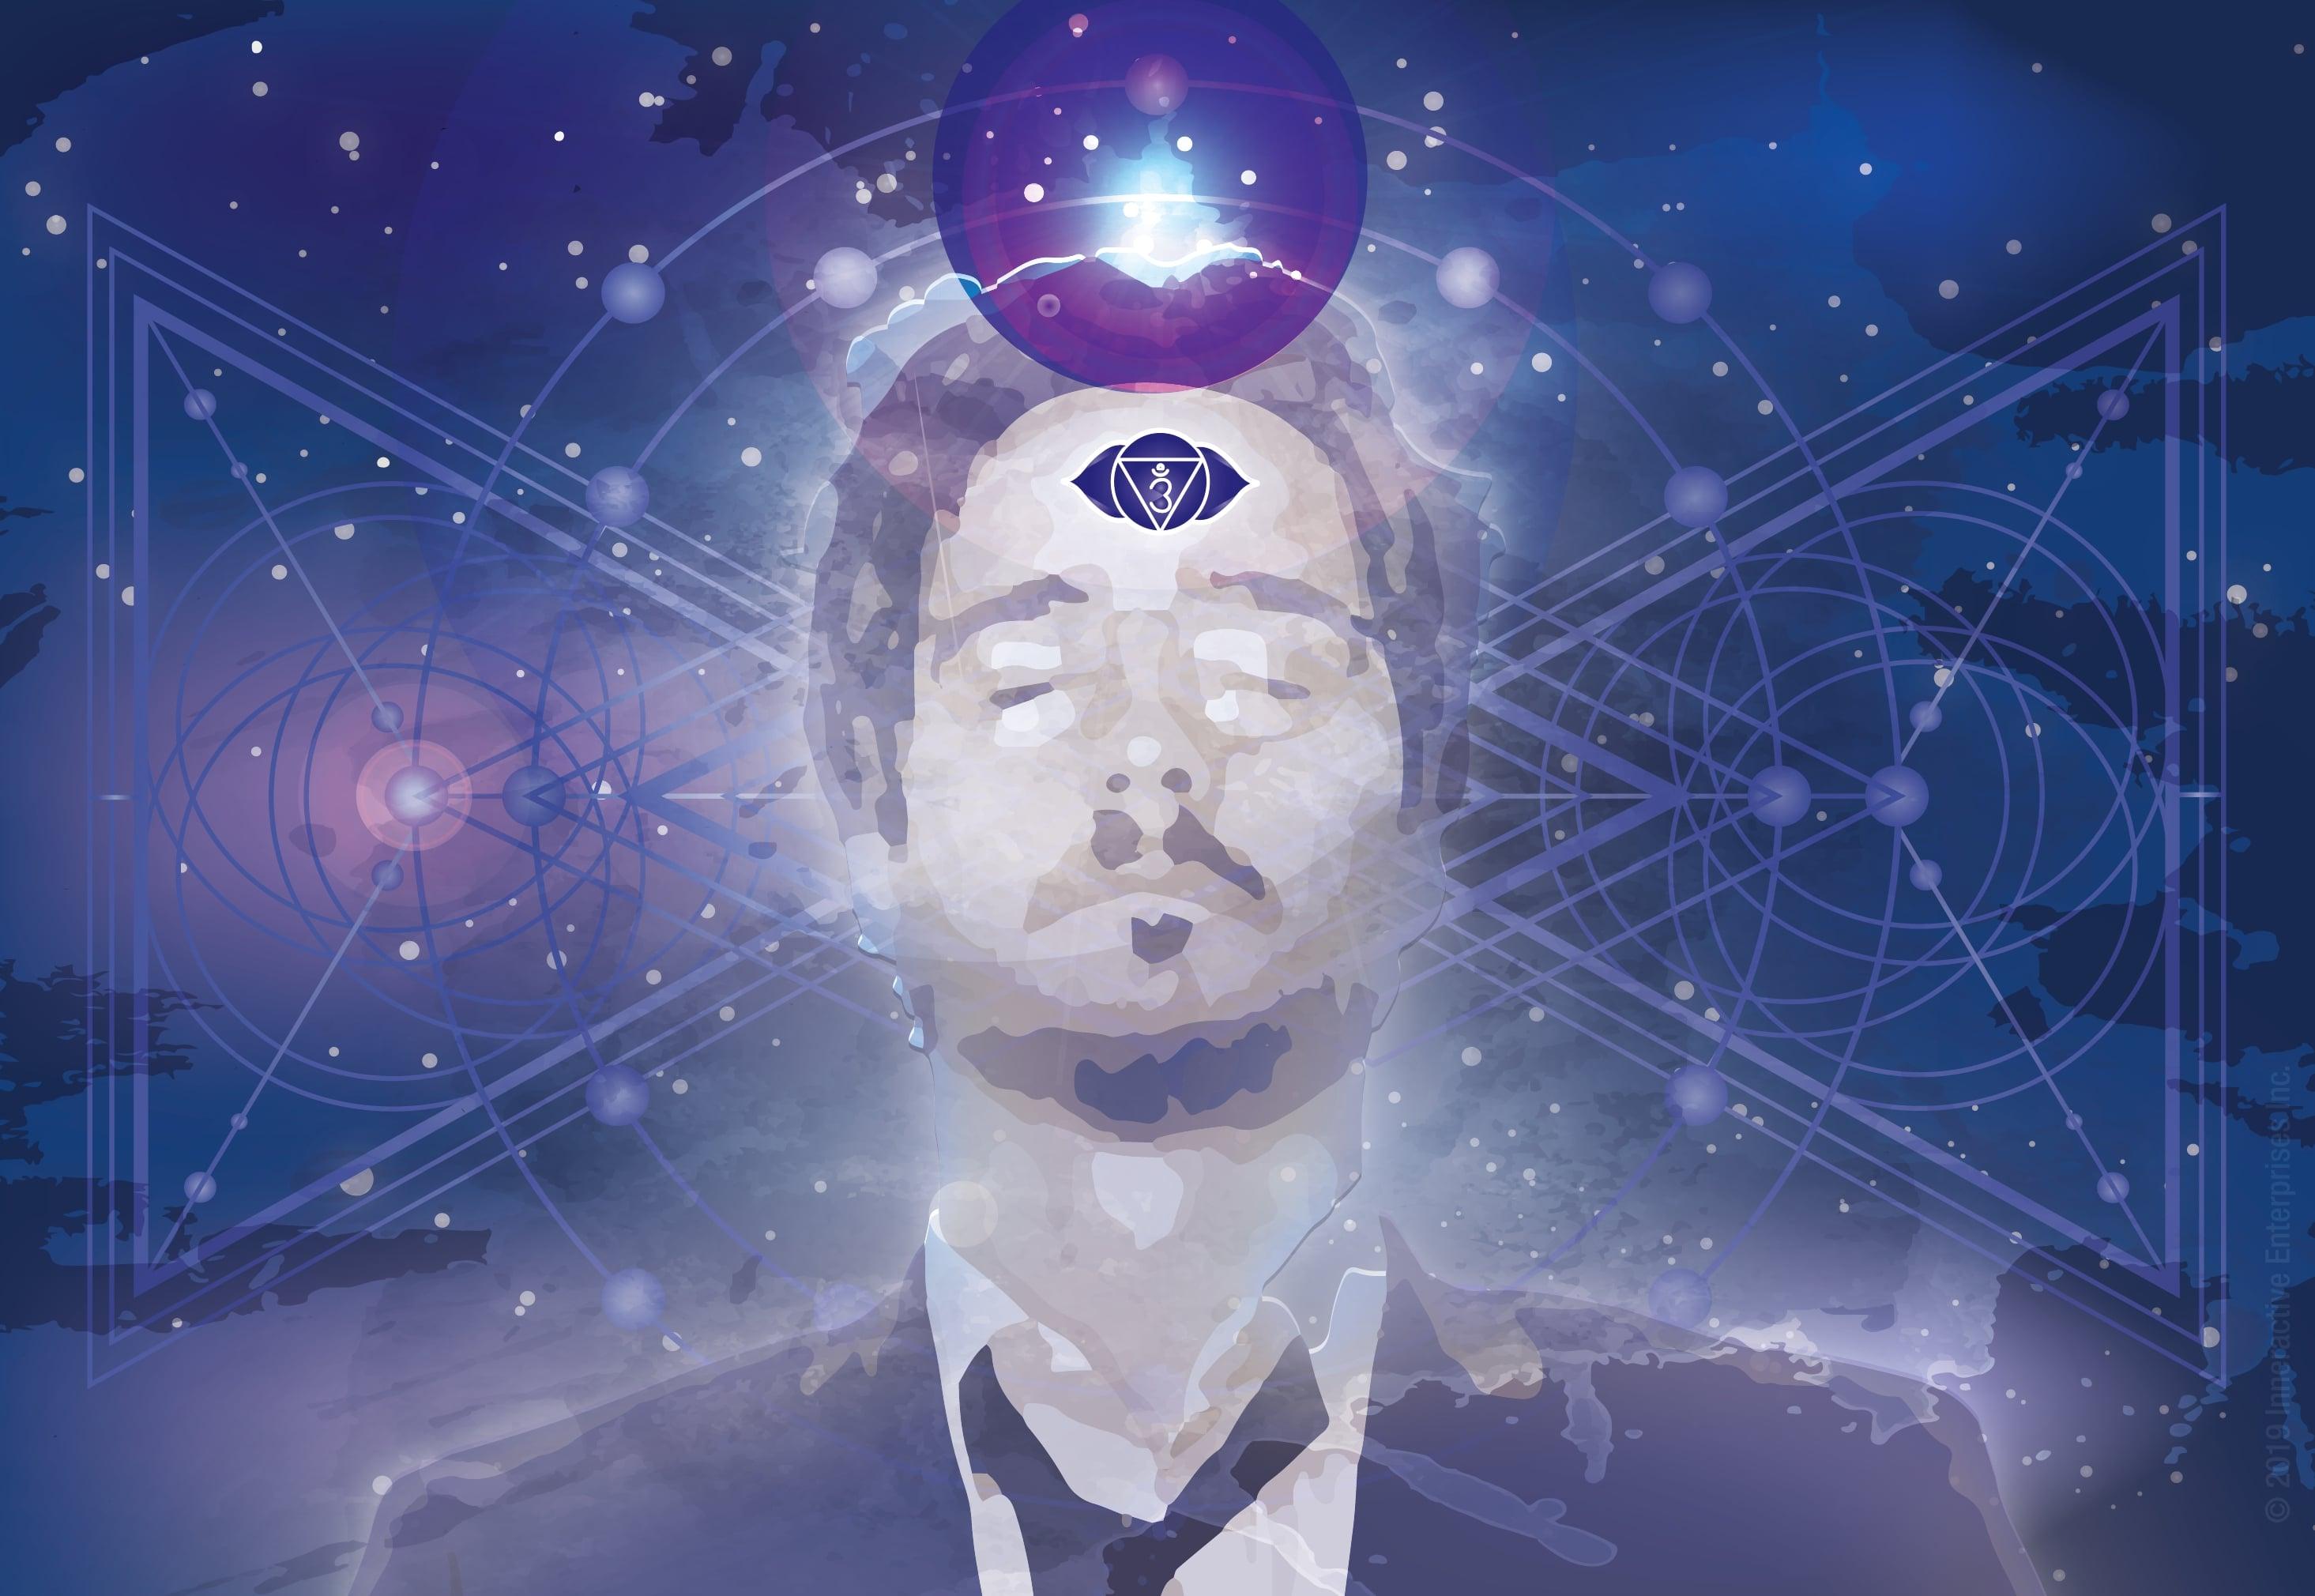 Chakra Third Eye Purple ball Illustration-01